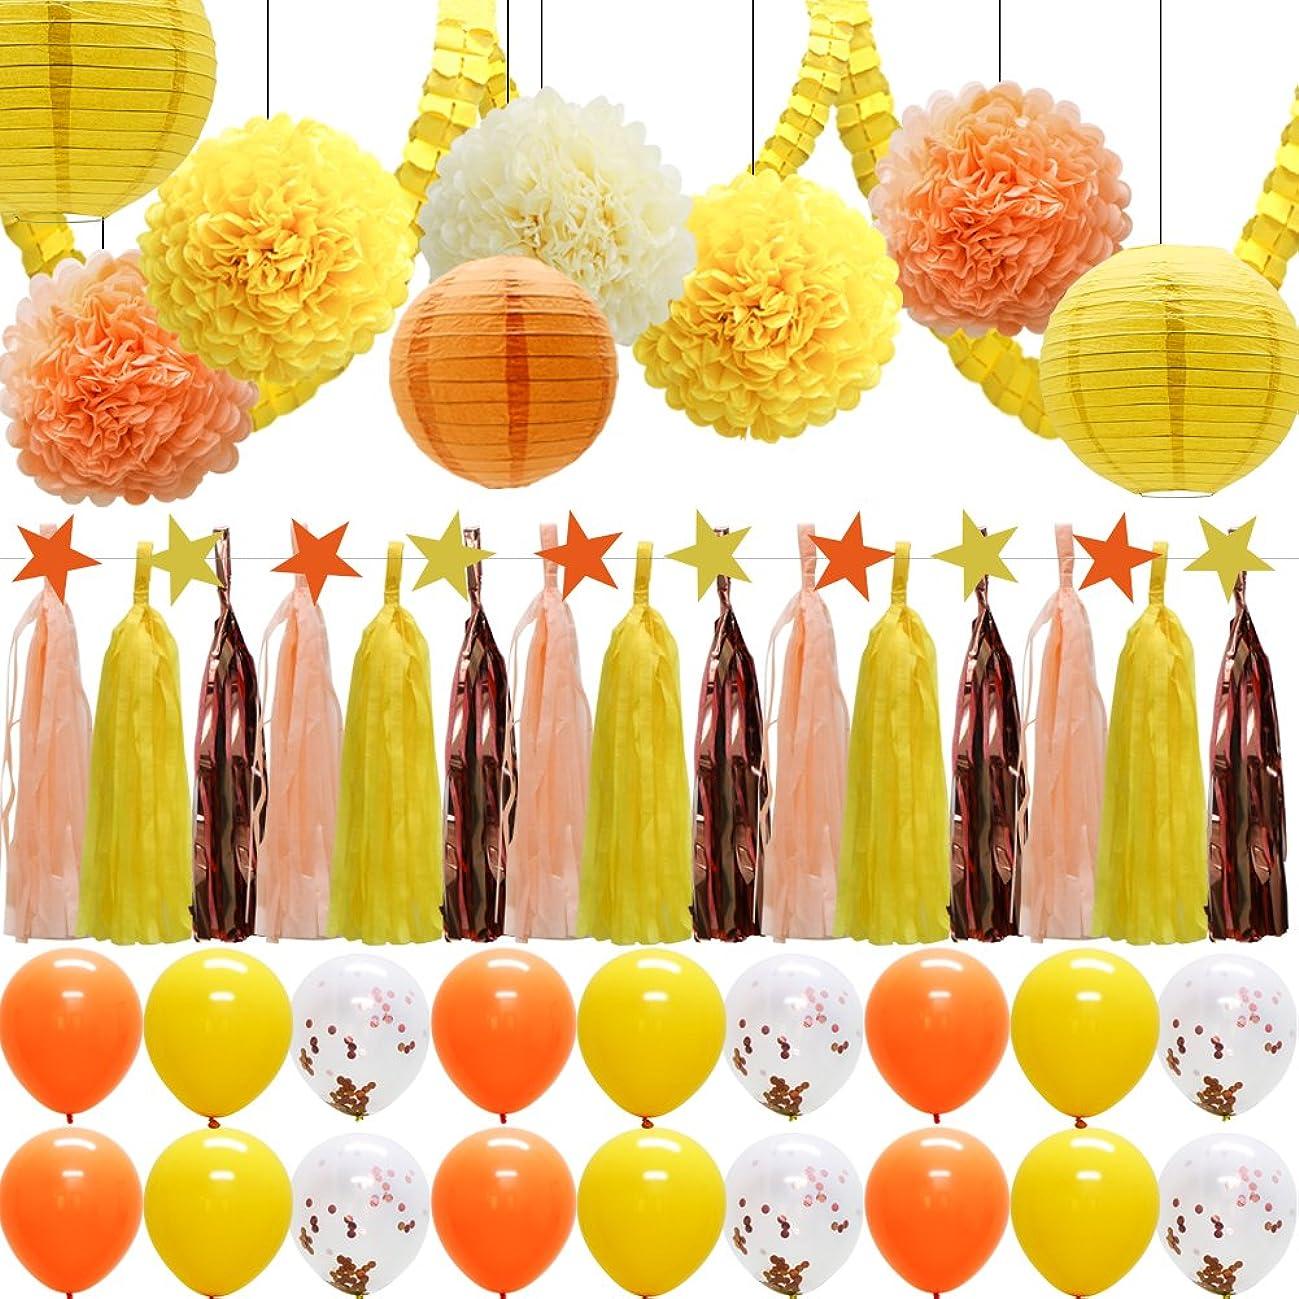 43pcs Hanging Party Decoration Supplies Kit - Tissue Paper Flowers Pom Poms Lanterns Tassel Garland Banner Clover Garland 18 Balloons for Baby Sunshine Birthday Bridal Shower Wedding (Yellow, Orange)